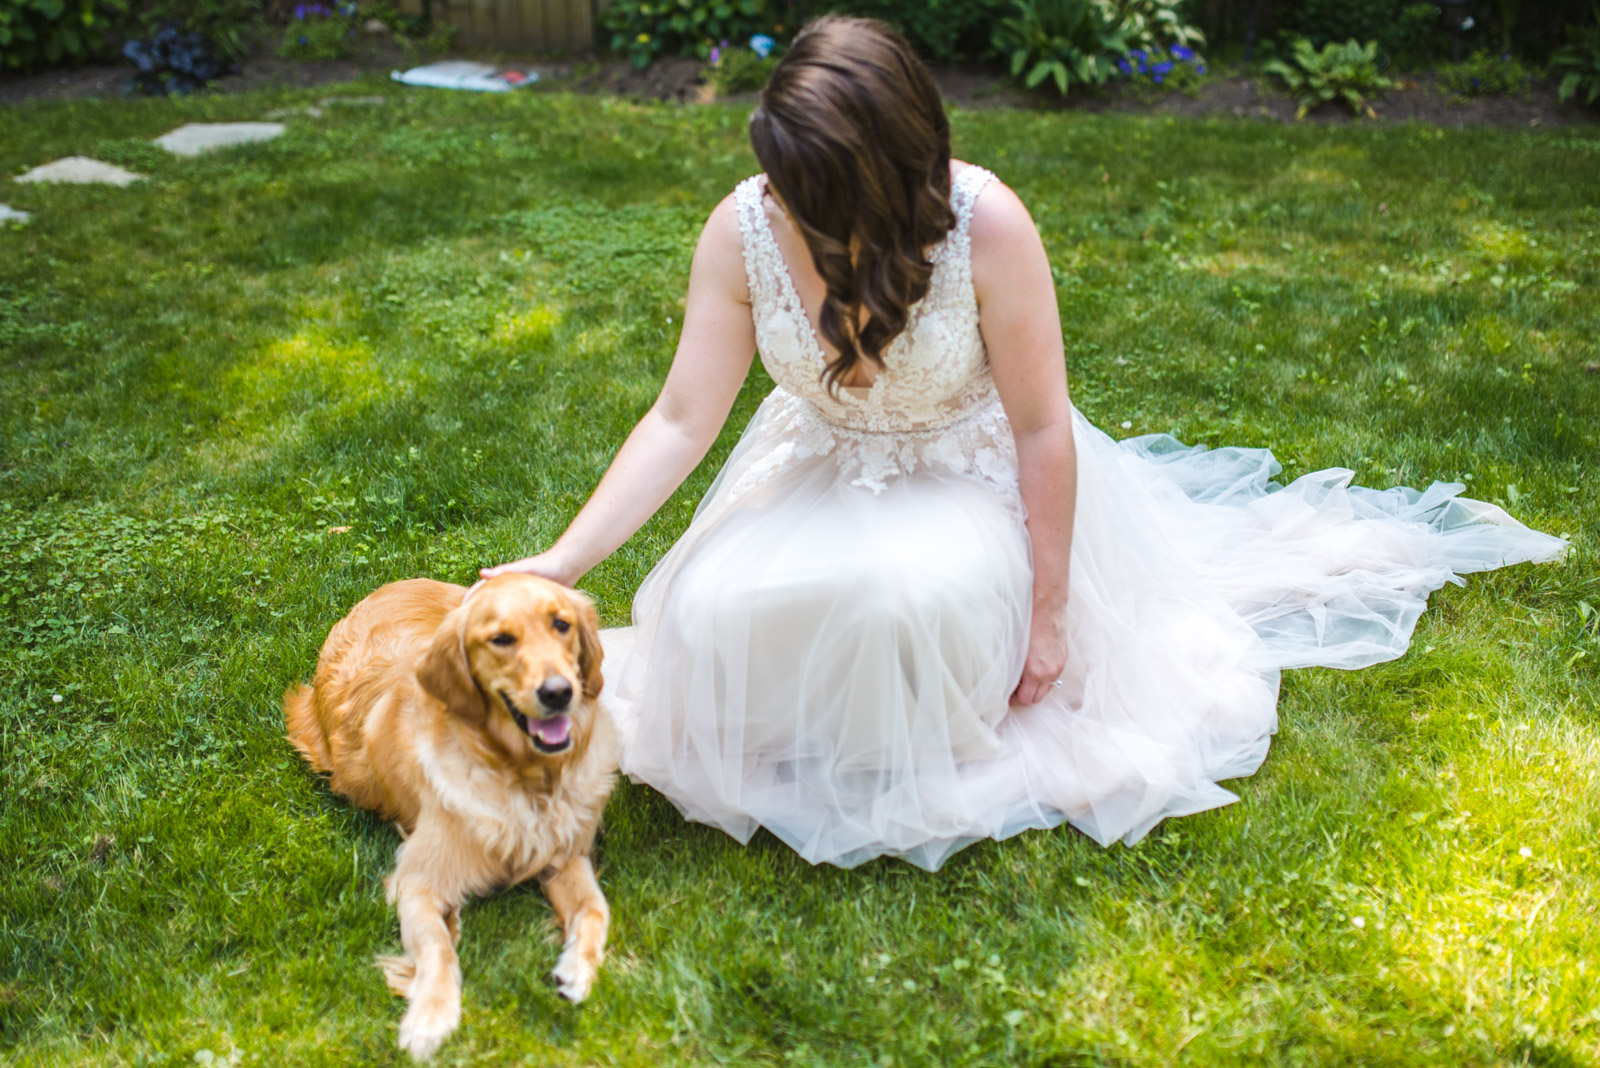 Emerson & Elicia's Golf Course Wedding Aidan & Leanne Hennebry Hamilton Wedding Videographers Photographers Niagara Hush Hush Photography & Film-3.jpg